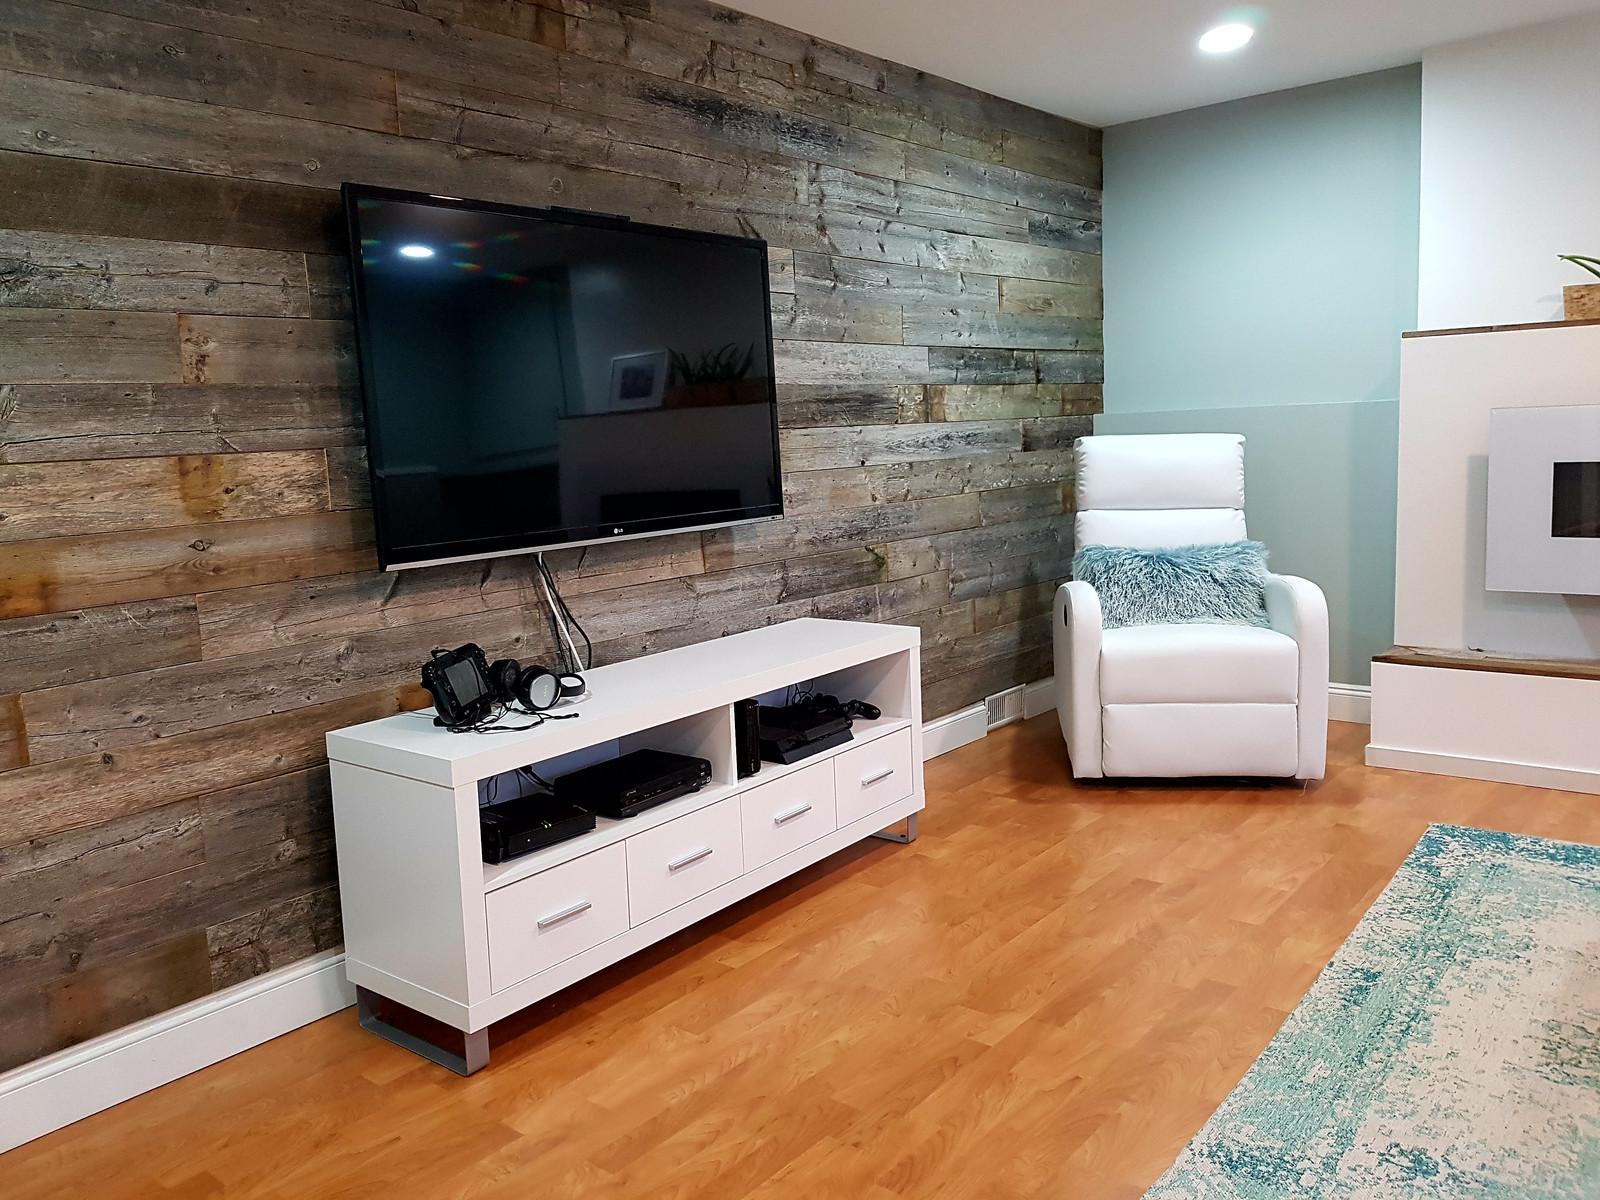 hand hewn interior wood reclaimed barn antique hemlock and walls nostalgic board mantle flooring